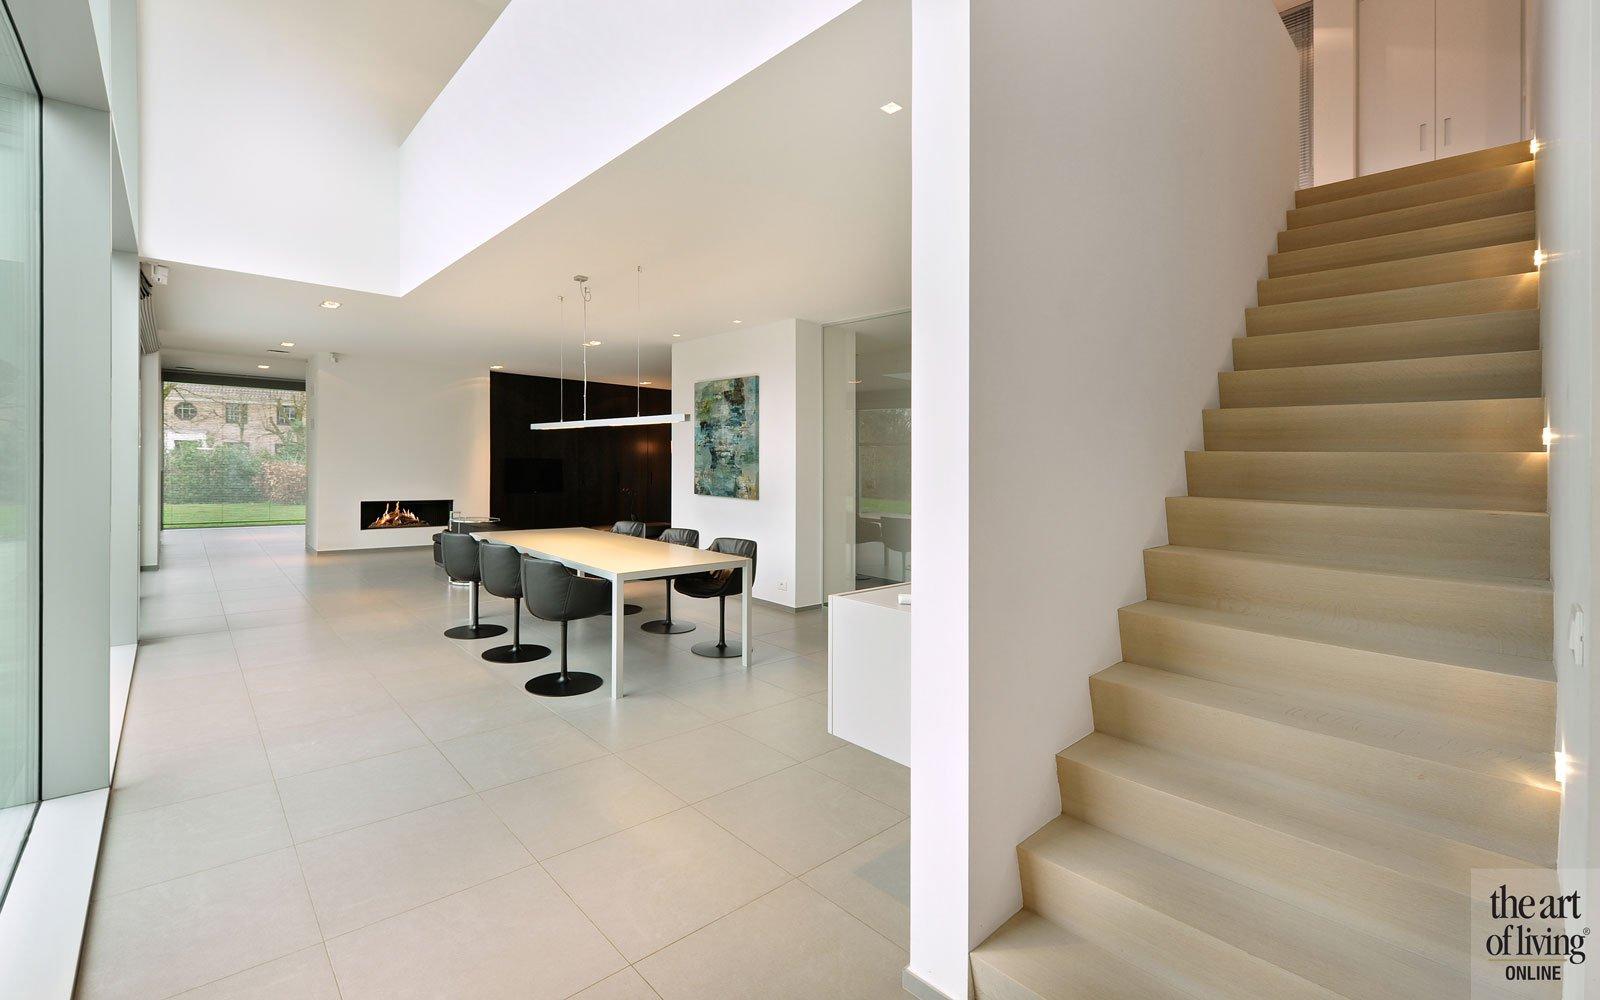 Eetkamer, eettafel, houten tafel, ruimtelijk, trap, vide, krukjes, symmetrische woning, Schellen Architecten